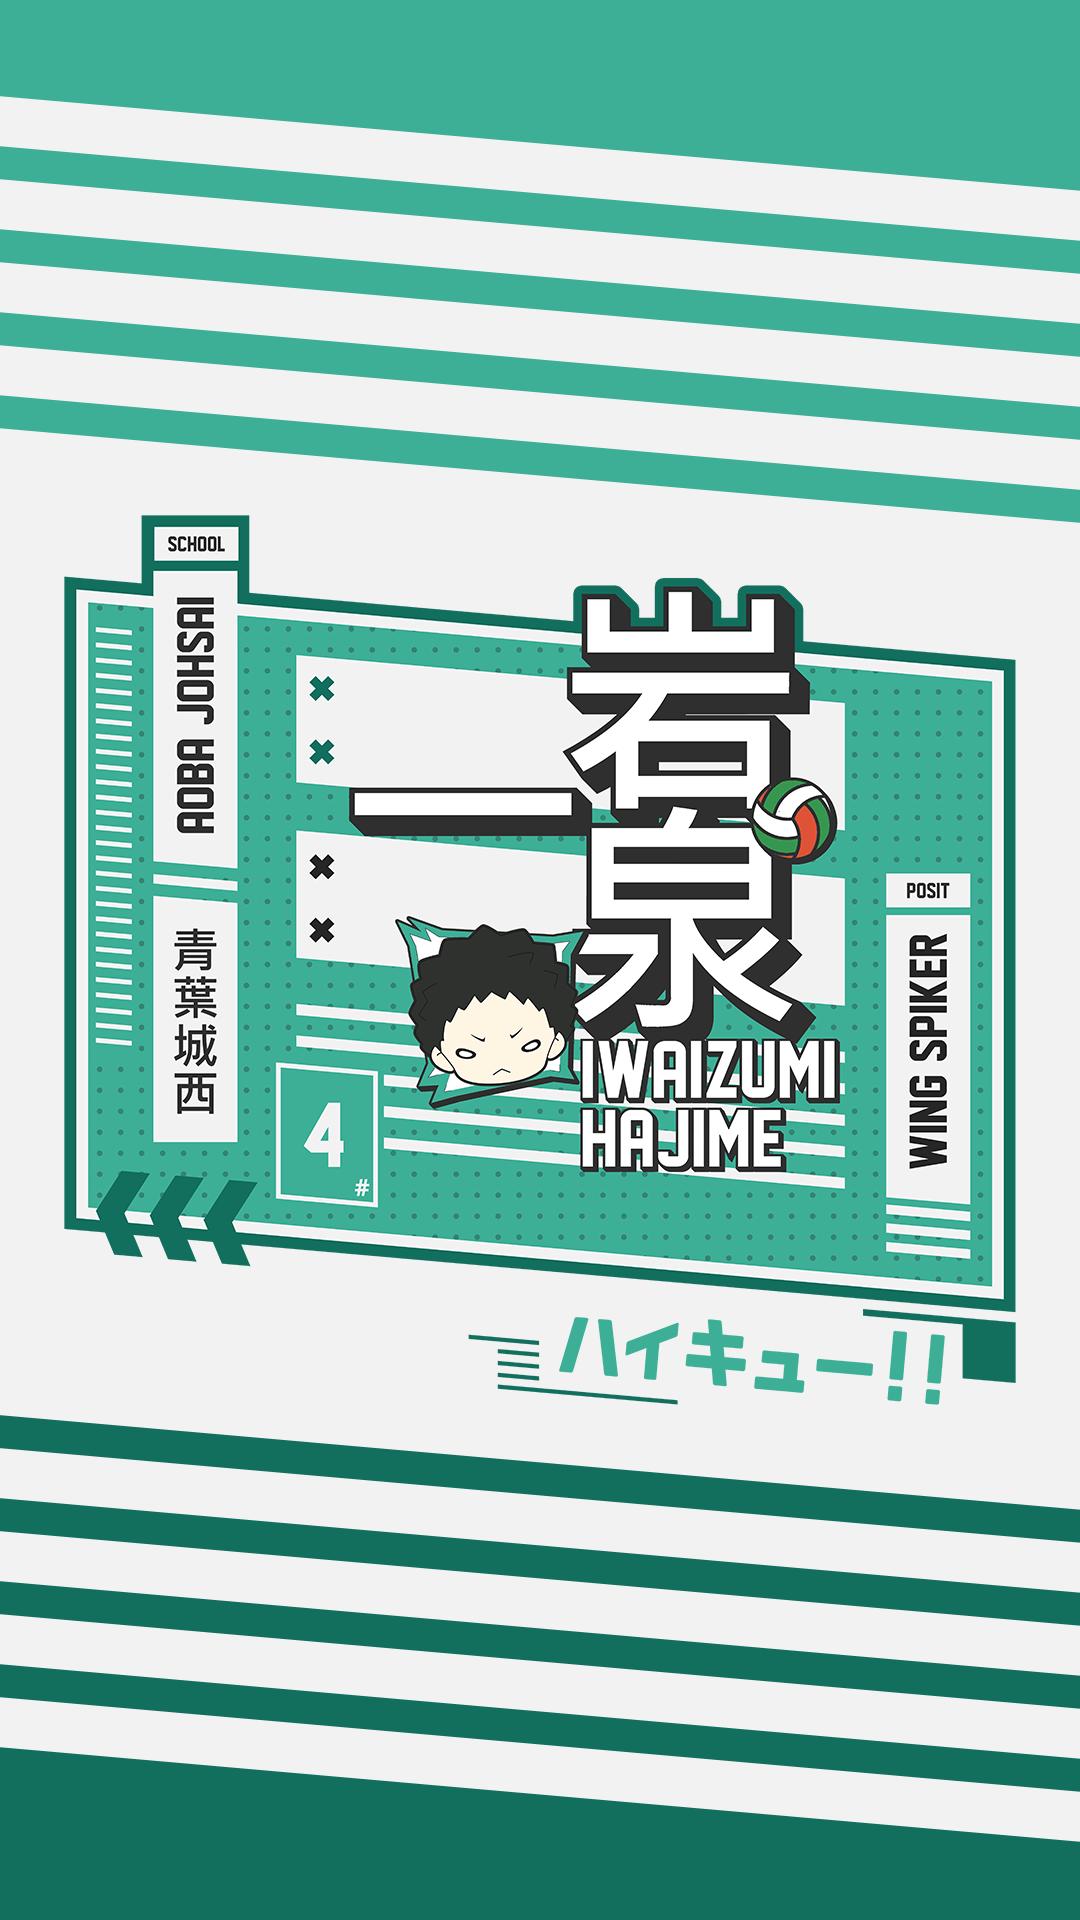 Iwaizumi Hajime Wallpaper Aoba Johsai In 2020 Haikyuu Wallpaper Iwaizumi Haikyuu Anime